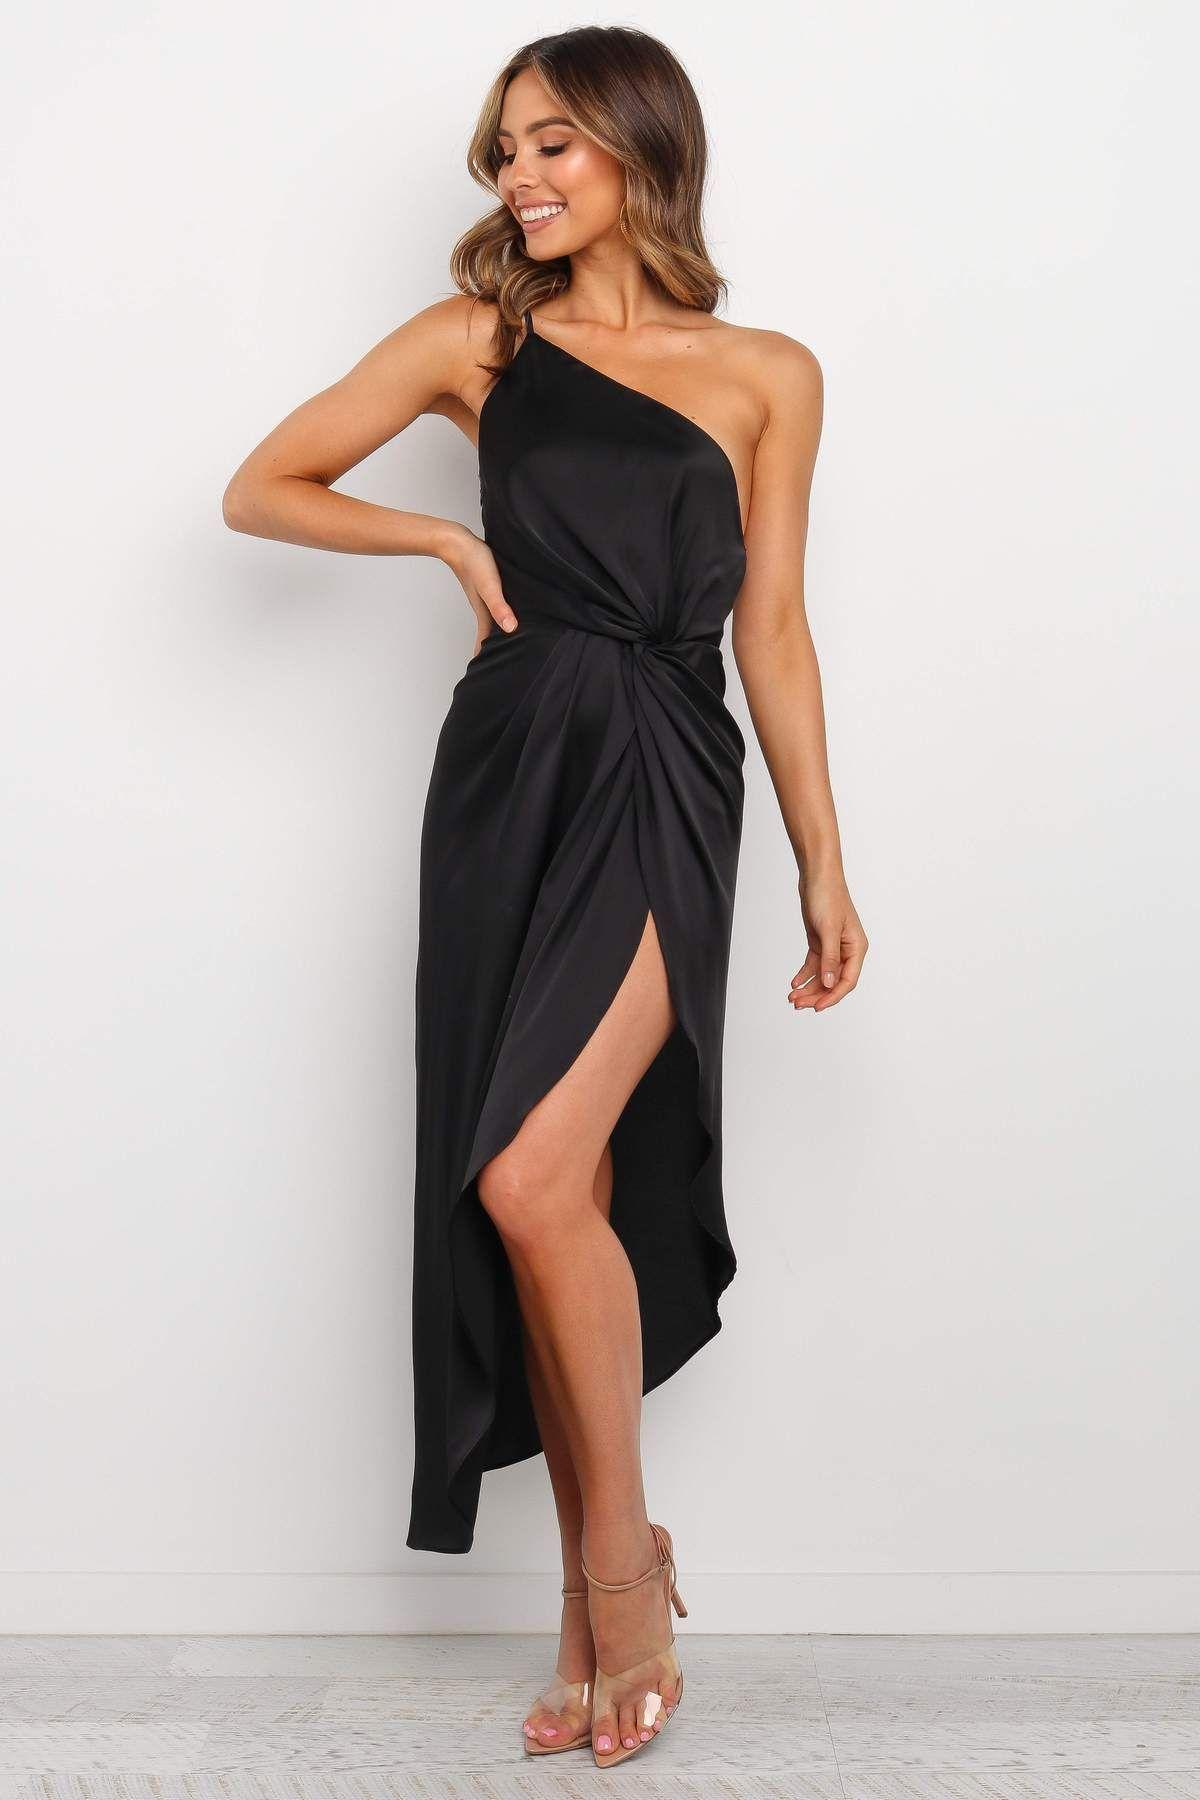 Utah Dress Black Dresses Midi Bridesmaid Dress Black One Shoulder Dress [ 1800 x 1200 Pixel ]